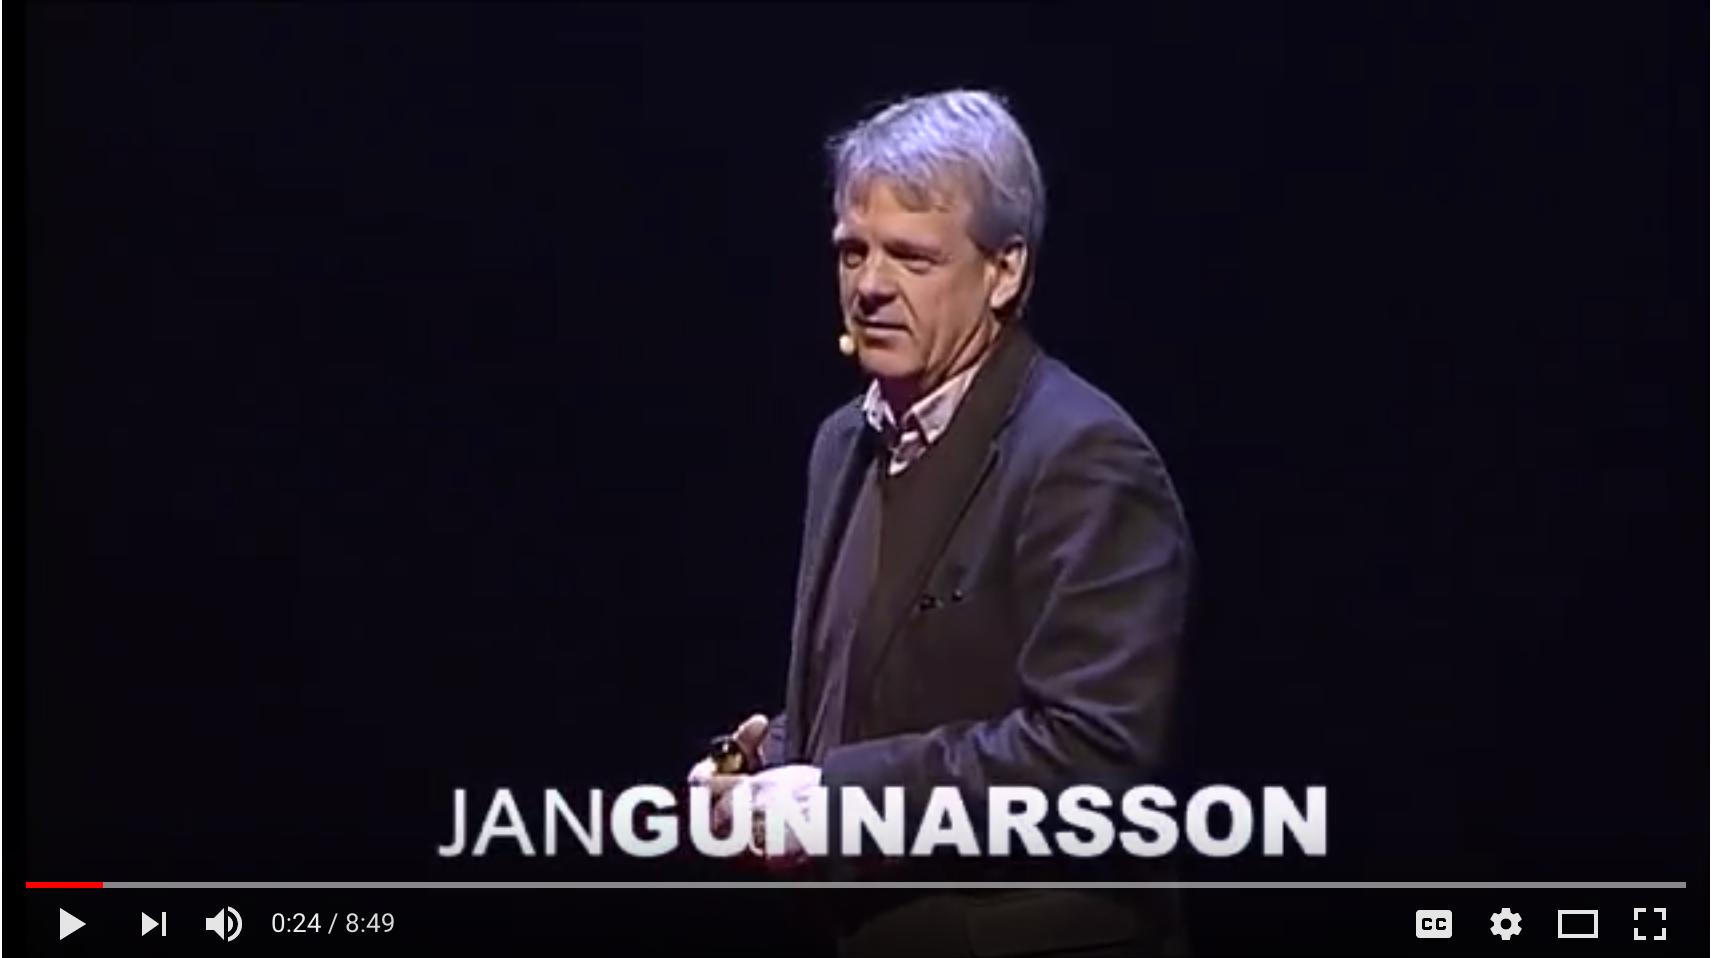 Jan Gunnarsson - Hostmanship: the art of making people feel welcome - Tedx Talks